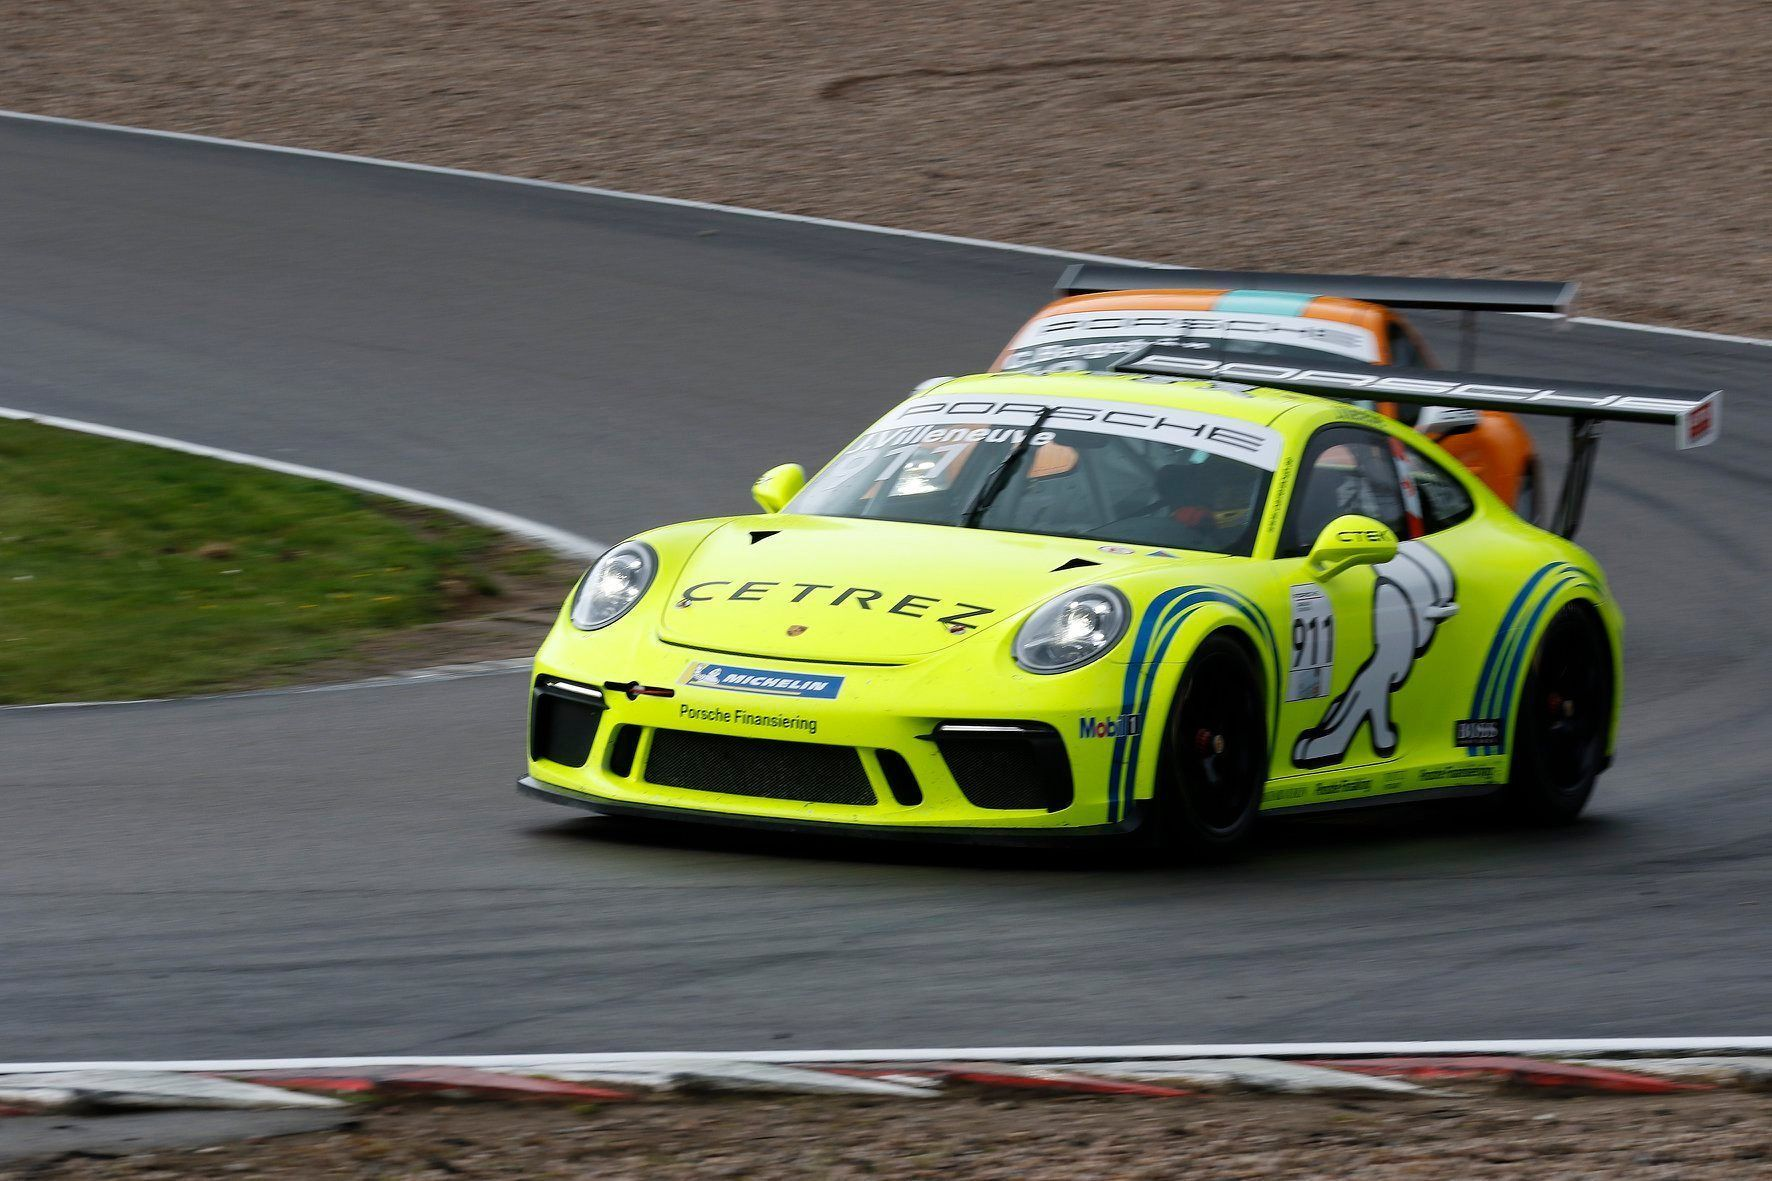 Jacques Villeneuve, Porsche Carrera Cup Scandinavia